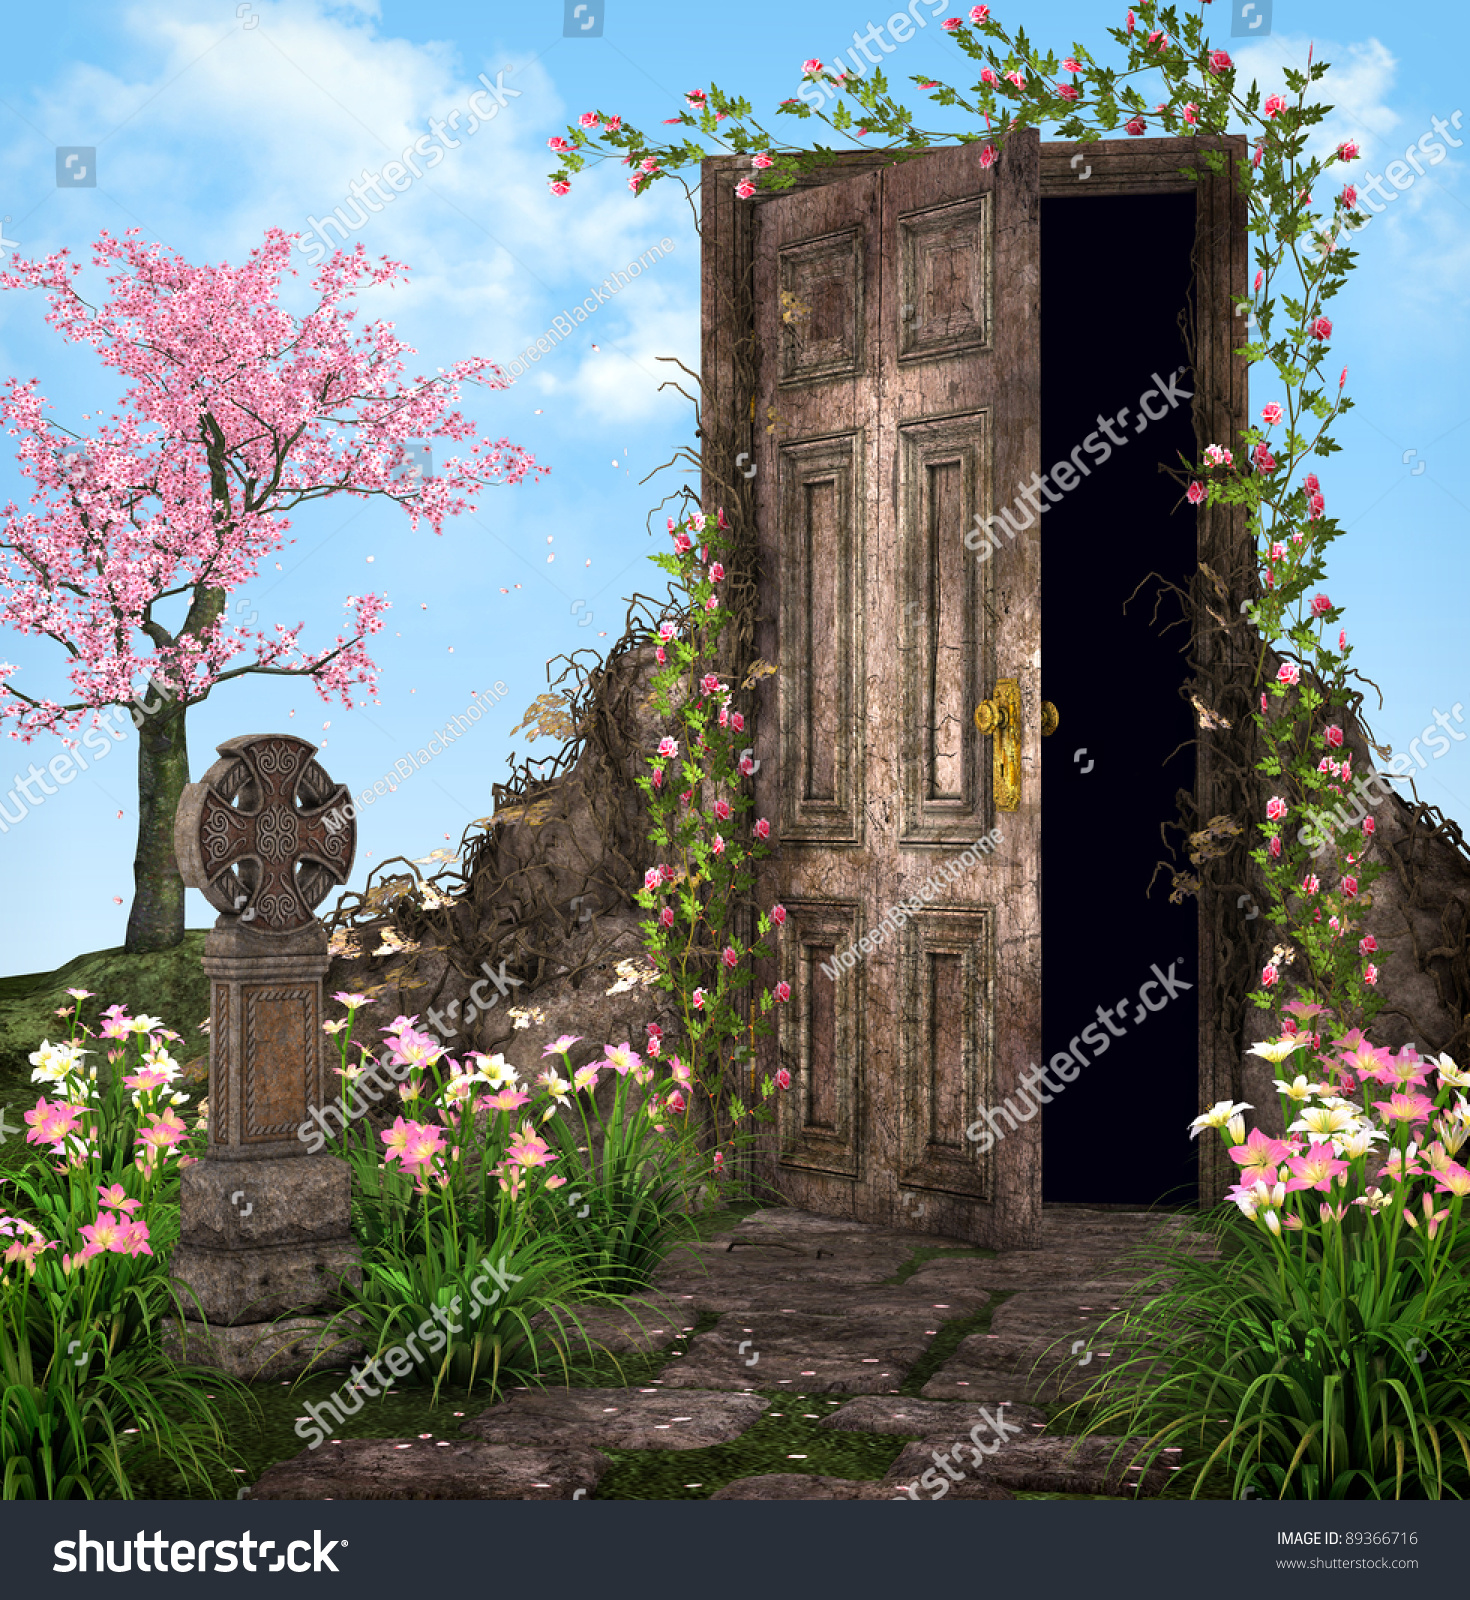 Enchanted Garden Stock Photo 89366716 : Shutterstock